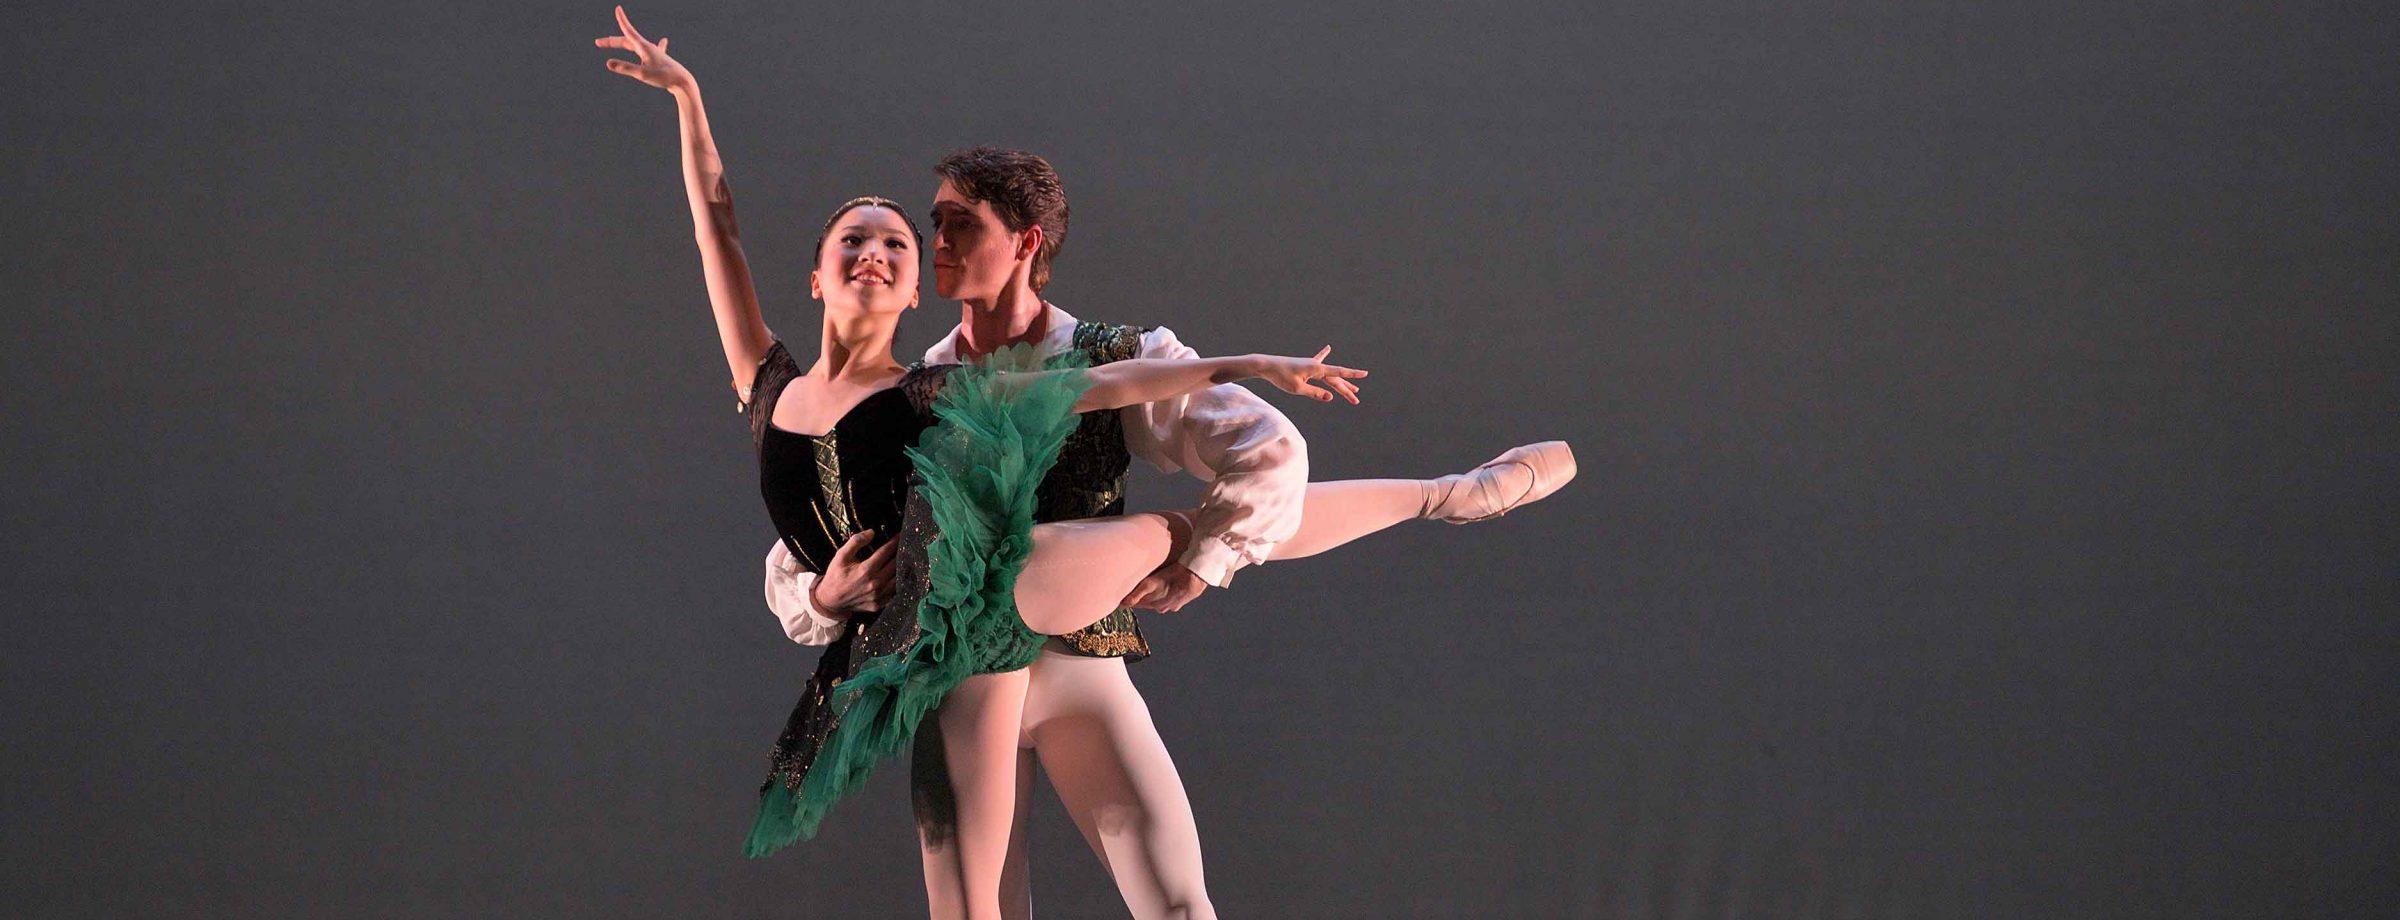 Rina-Kanehara-and-Aitor-Arrieta-performing-the-Esmeralda-pas-de-deux-(c)-Laurent-Liotardo